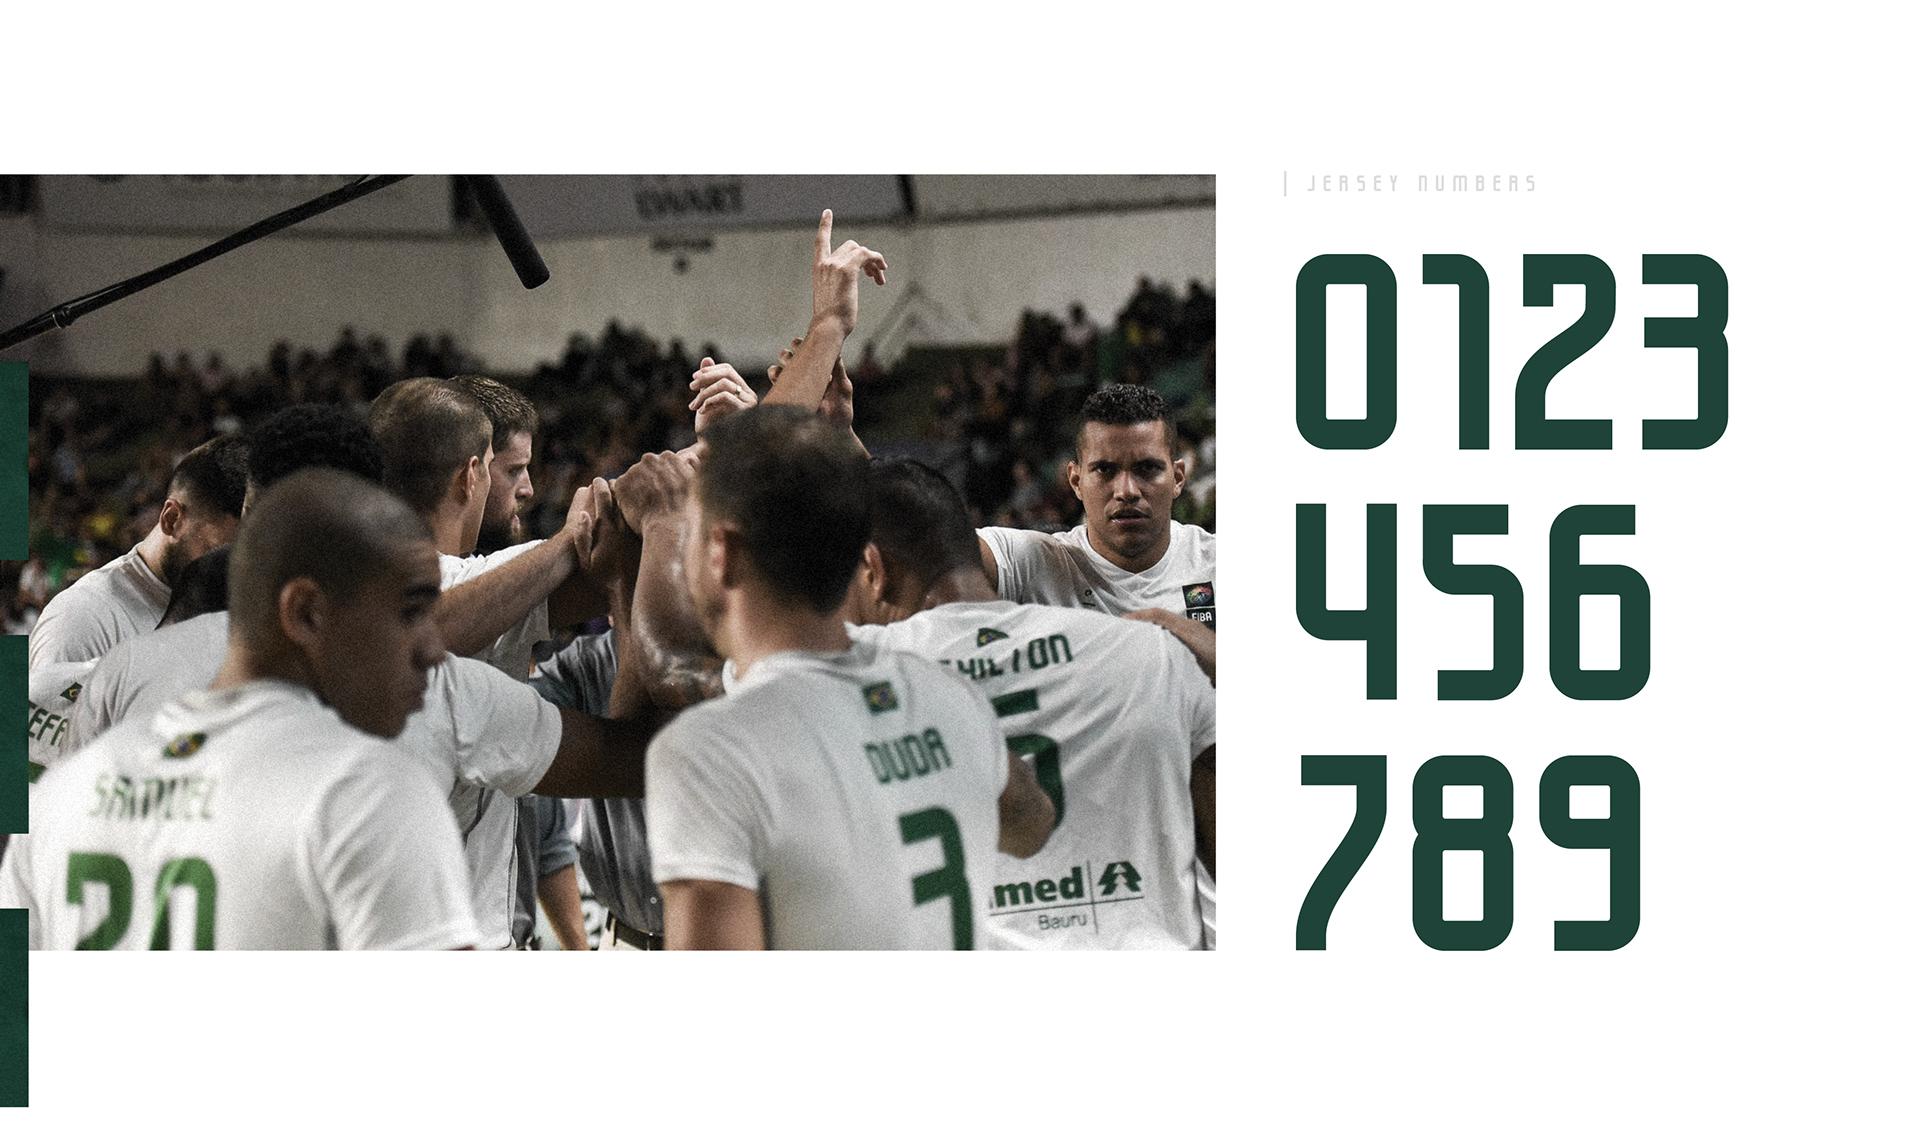 Bauru-Basket-Nacione-Branding-6